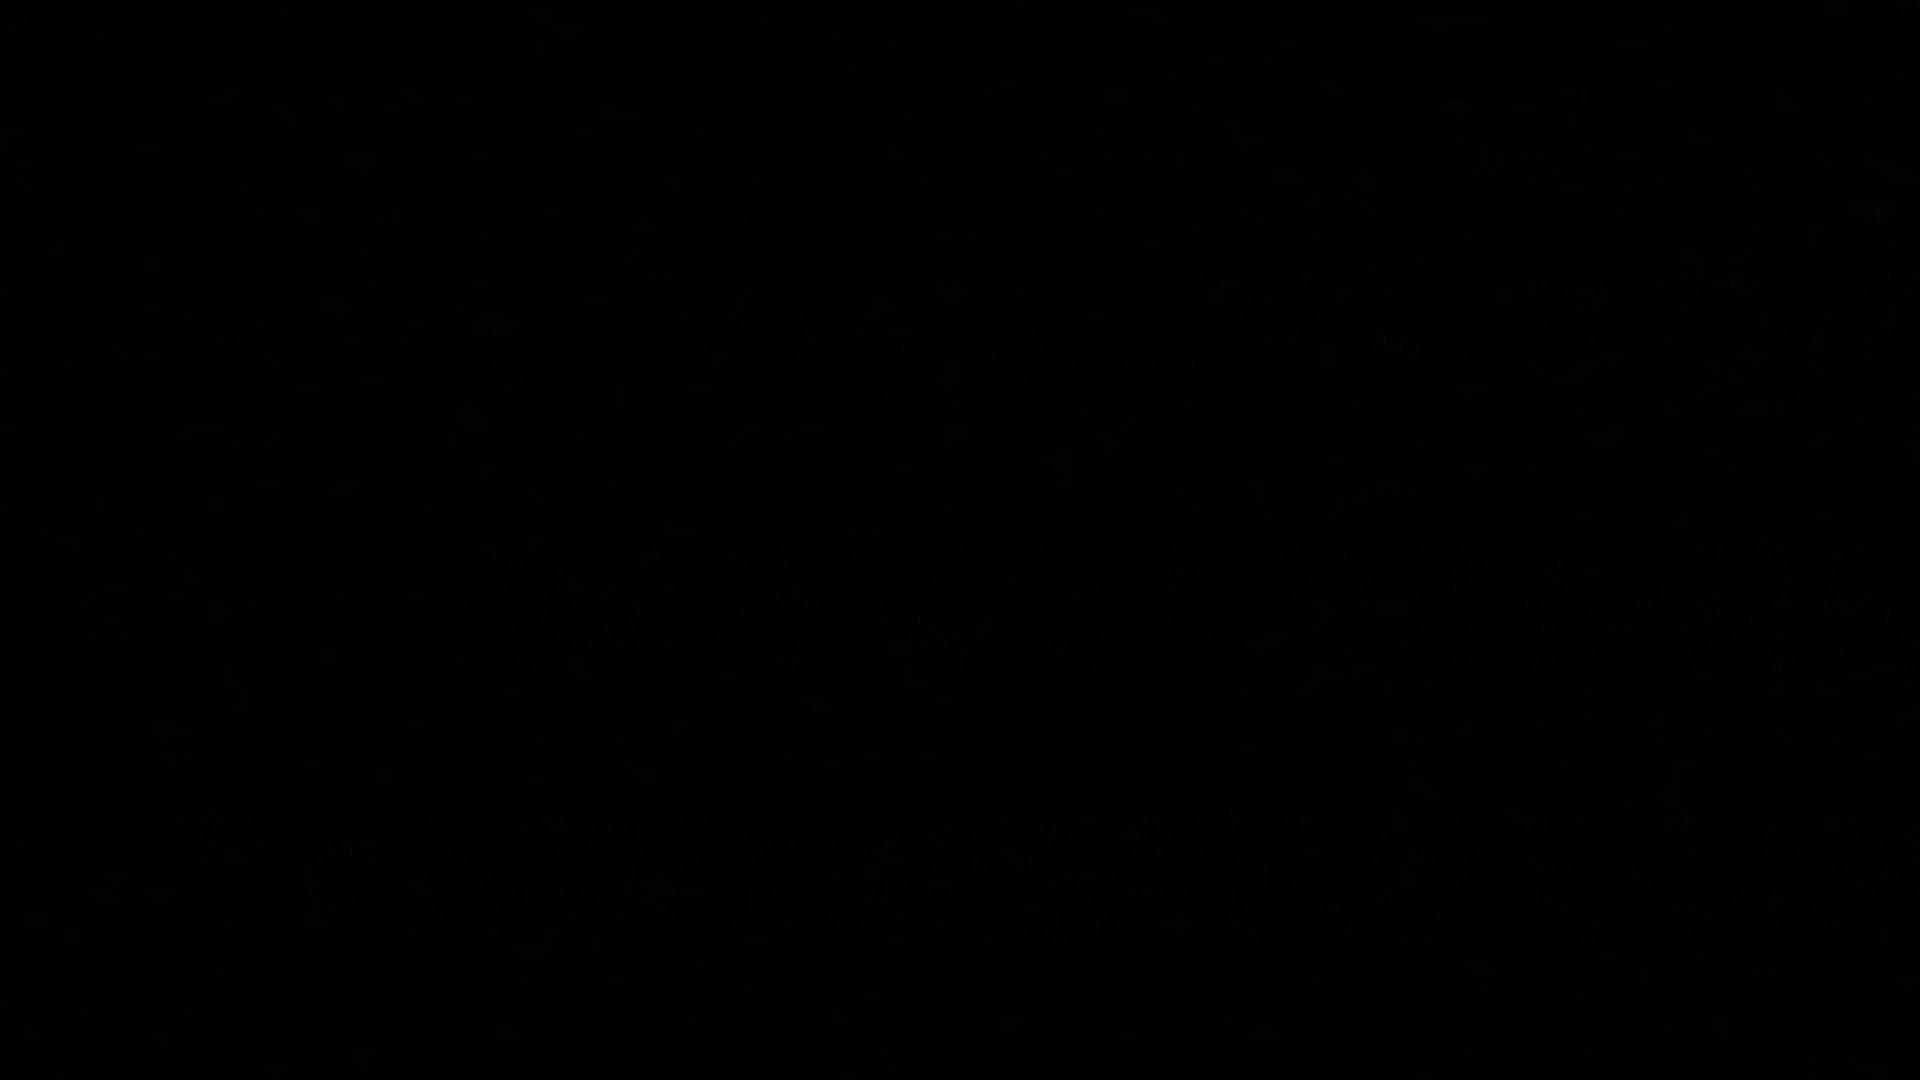 SPYさん初投稿!マンション覗き!5000K!ハイビジョン撮影VOL.01(現役野球部大学生編) 投稿 Guyエロ画像 95枚 7